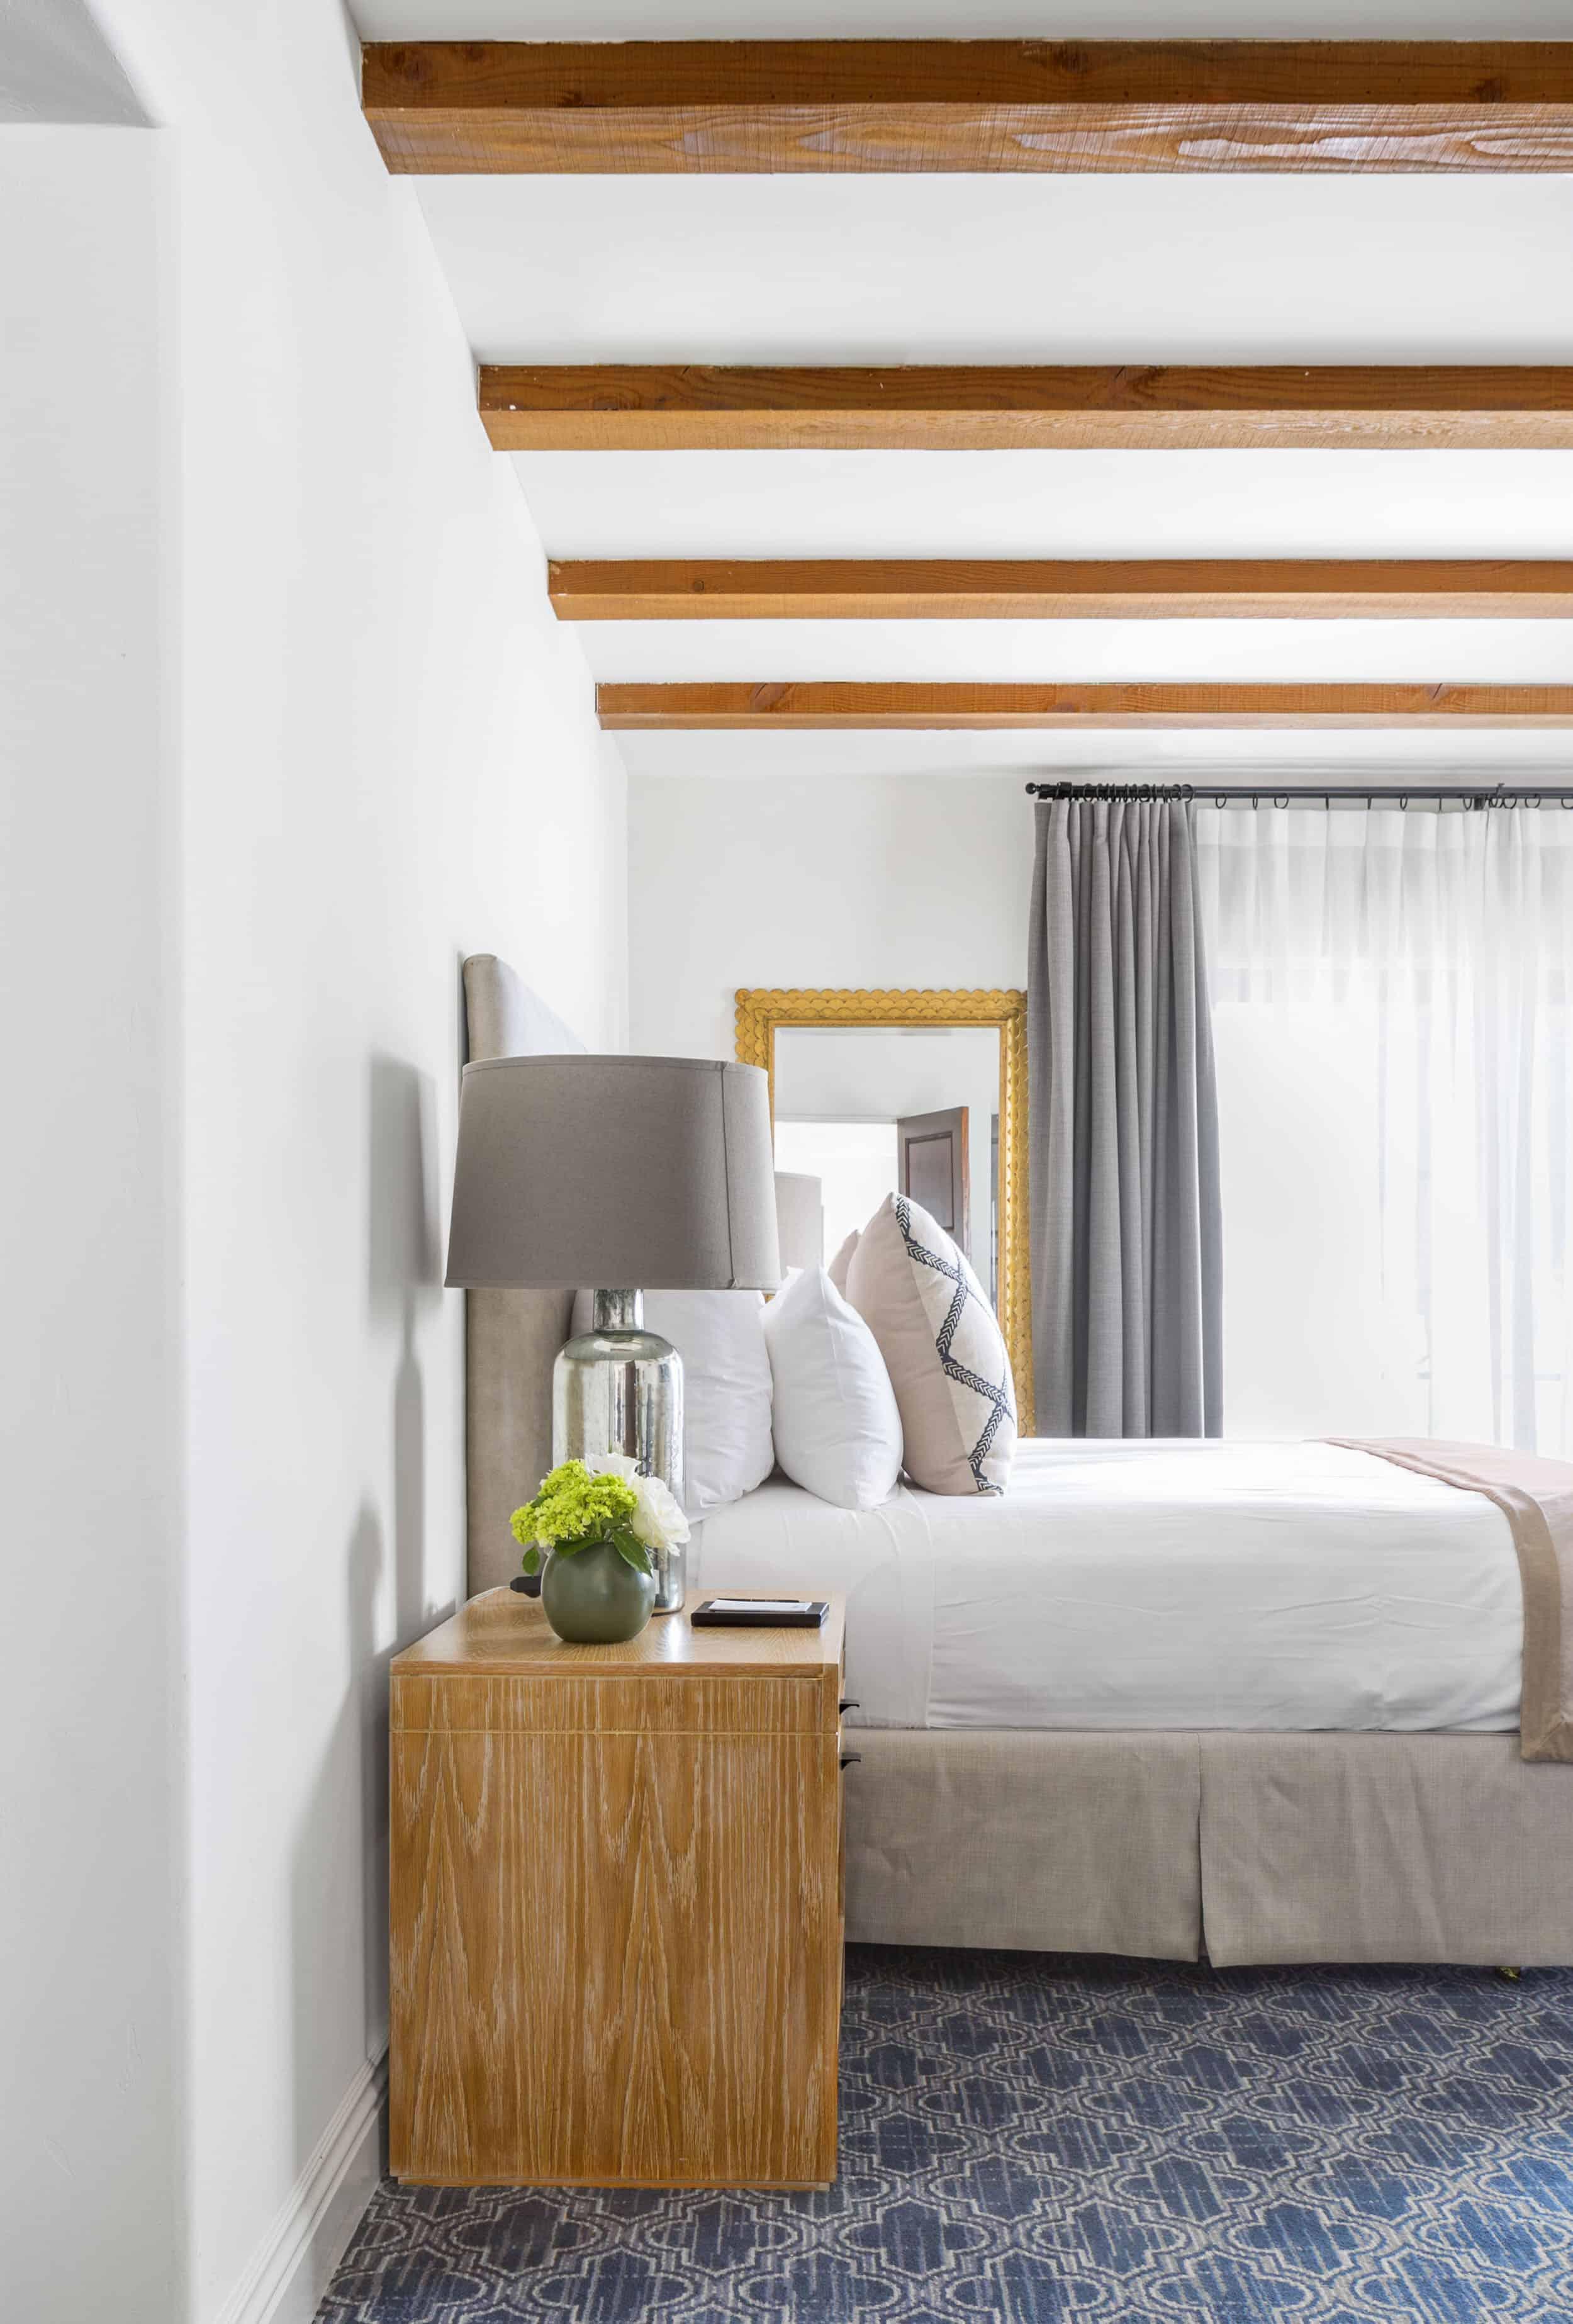 Ojai Valley Inn King Suite Modern Hotel